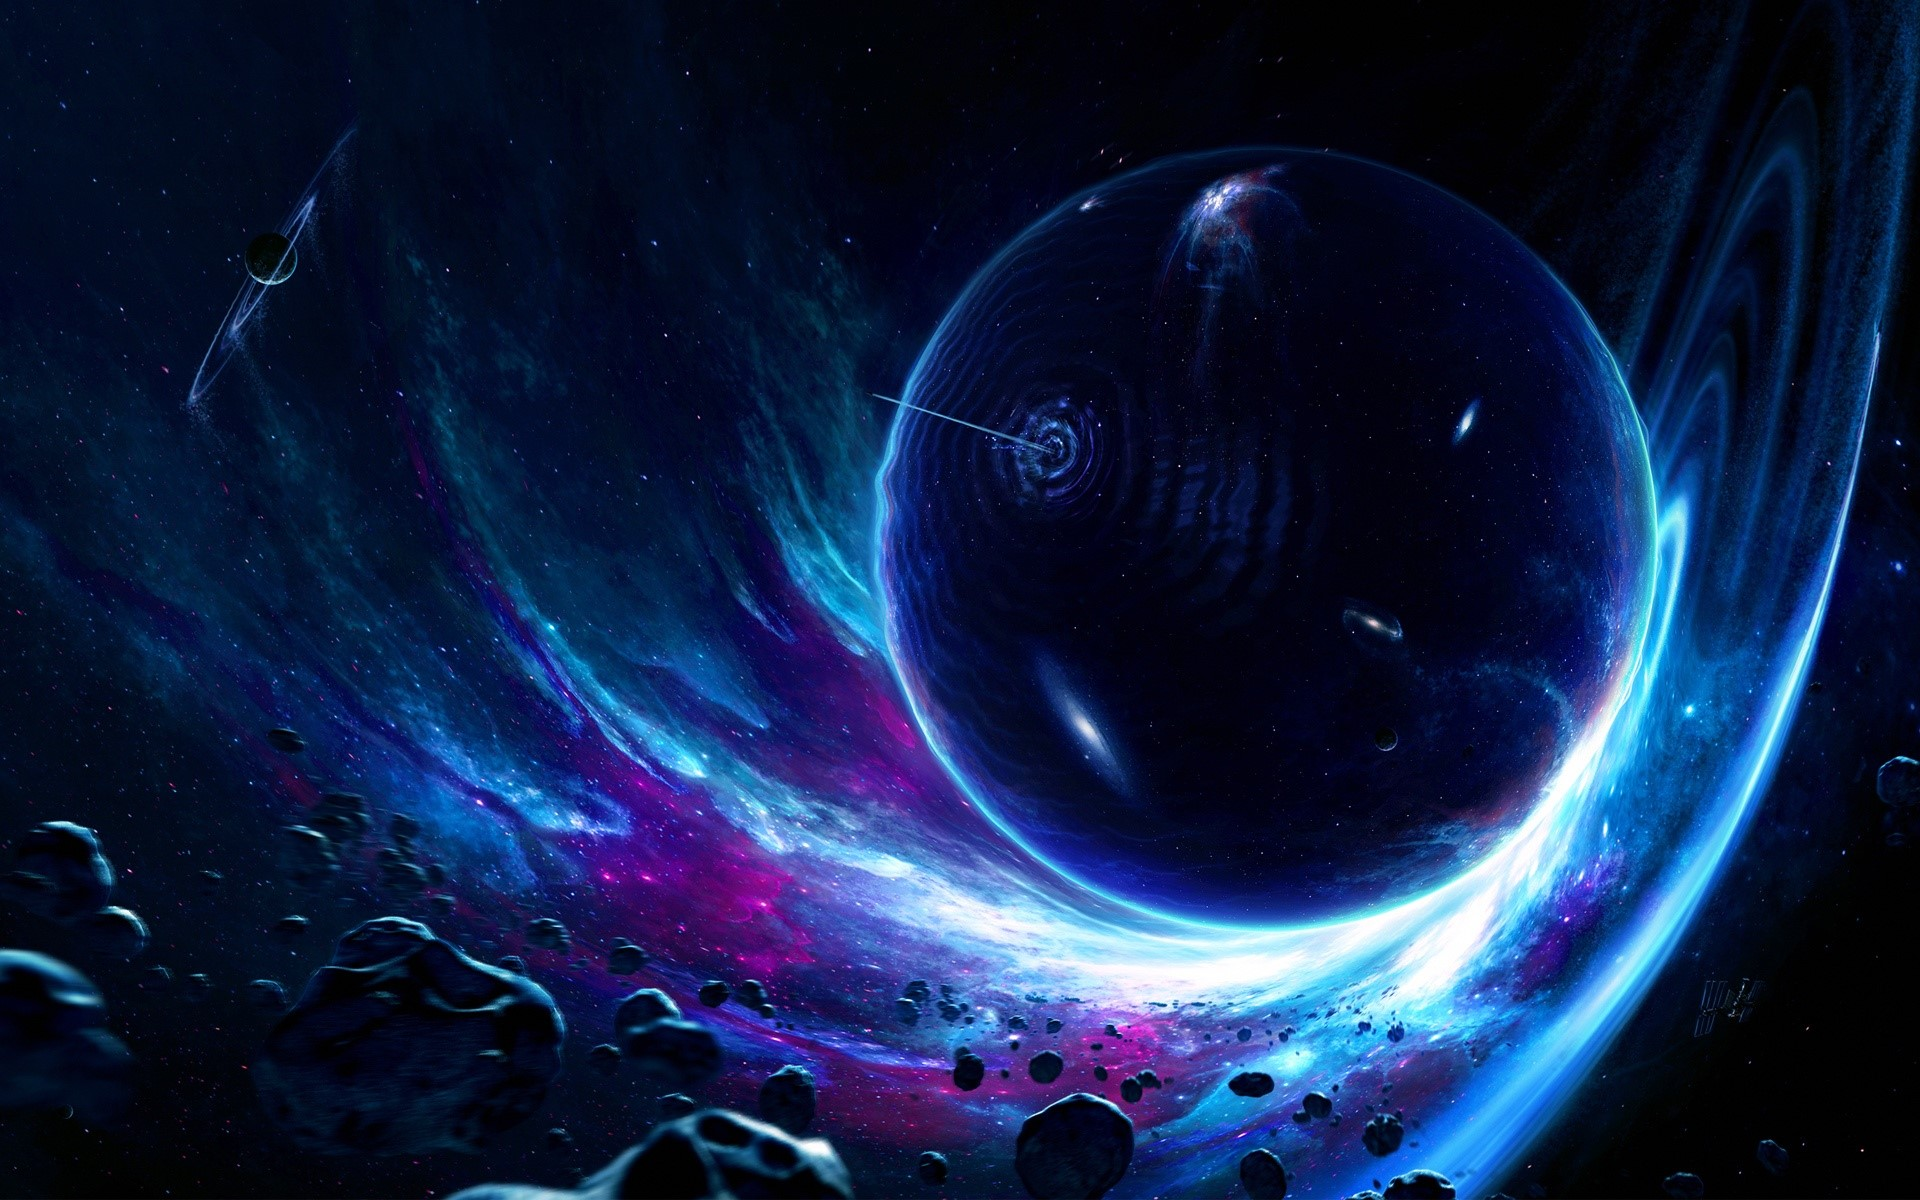 Fondos de pantalla Atravesando un planeta